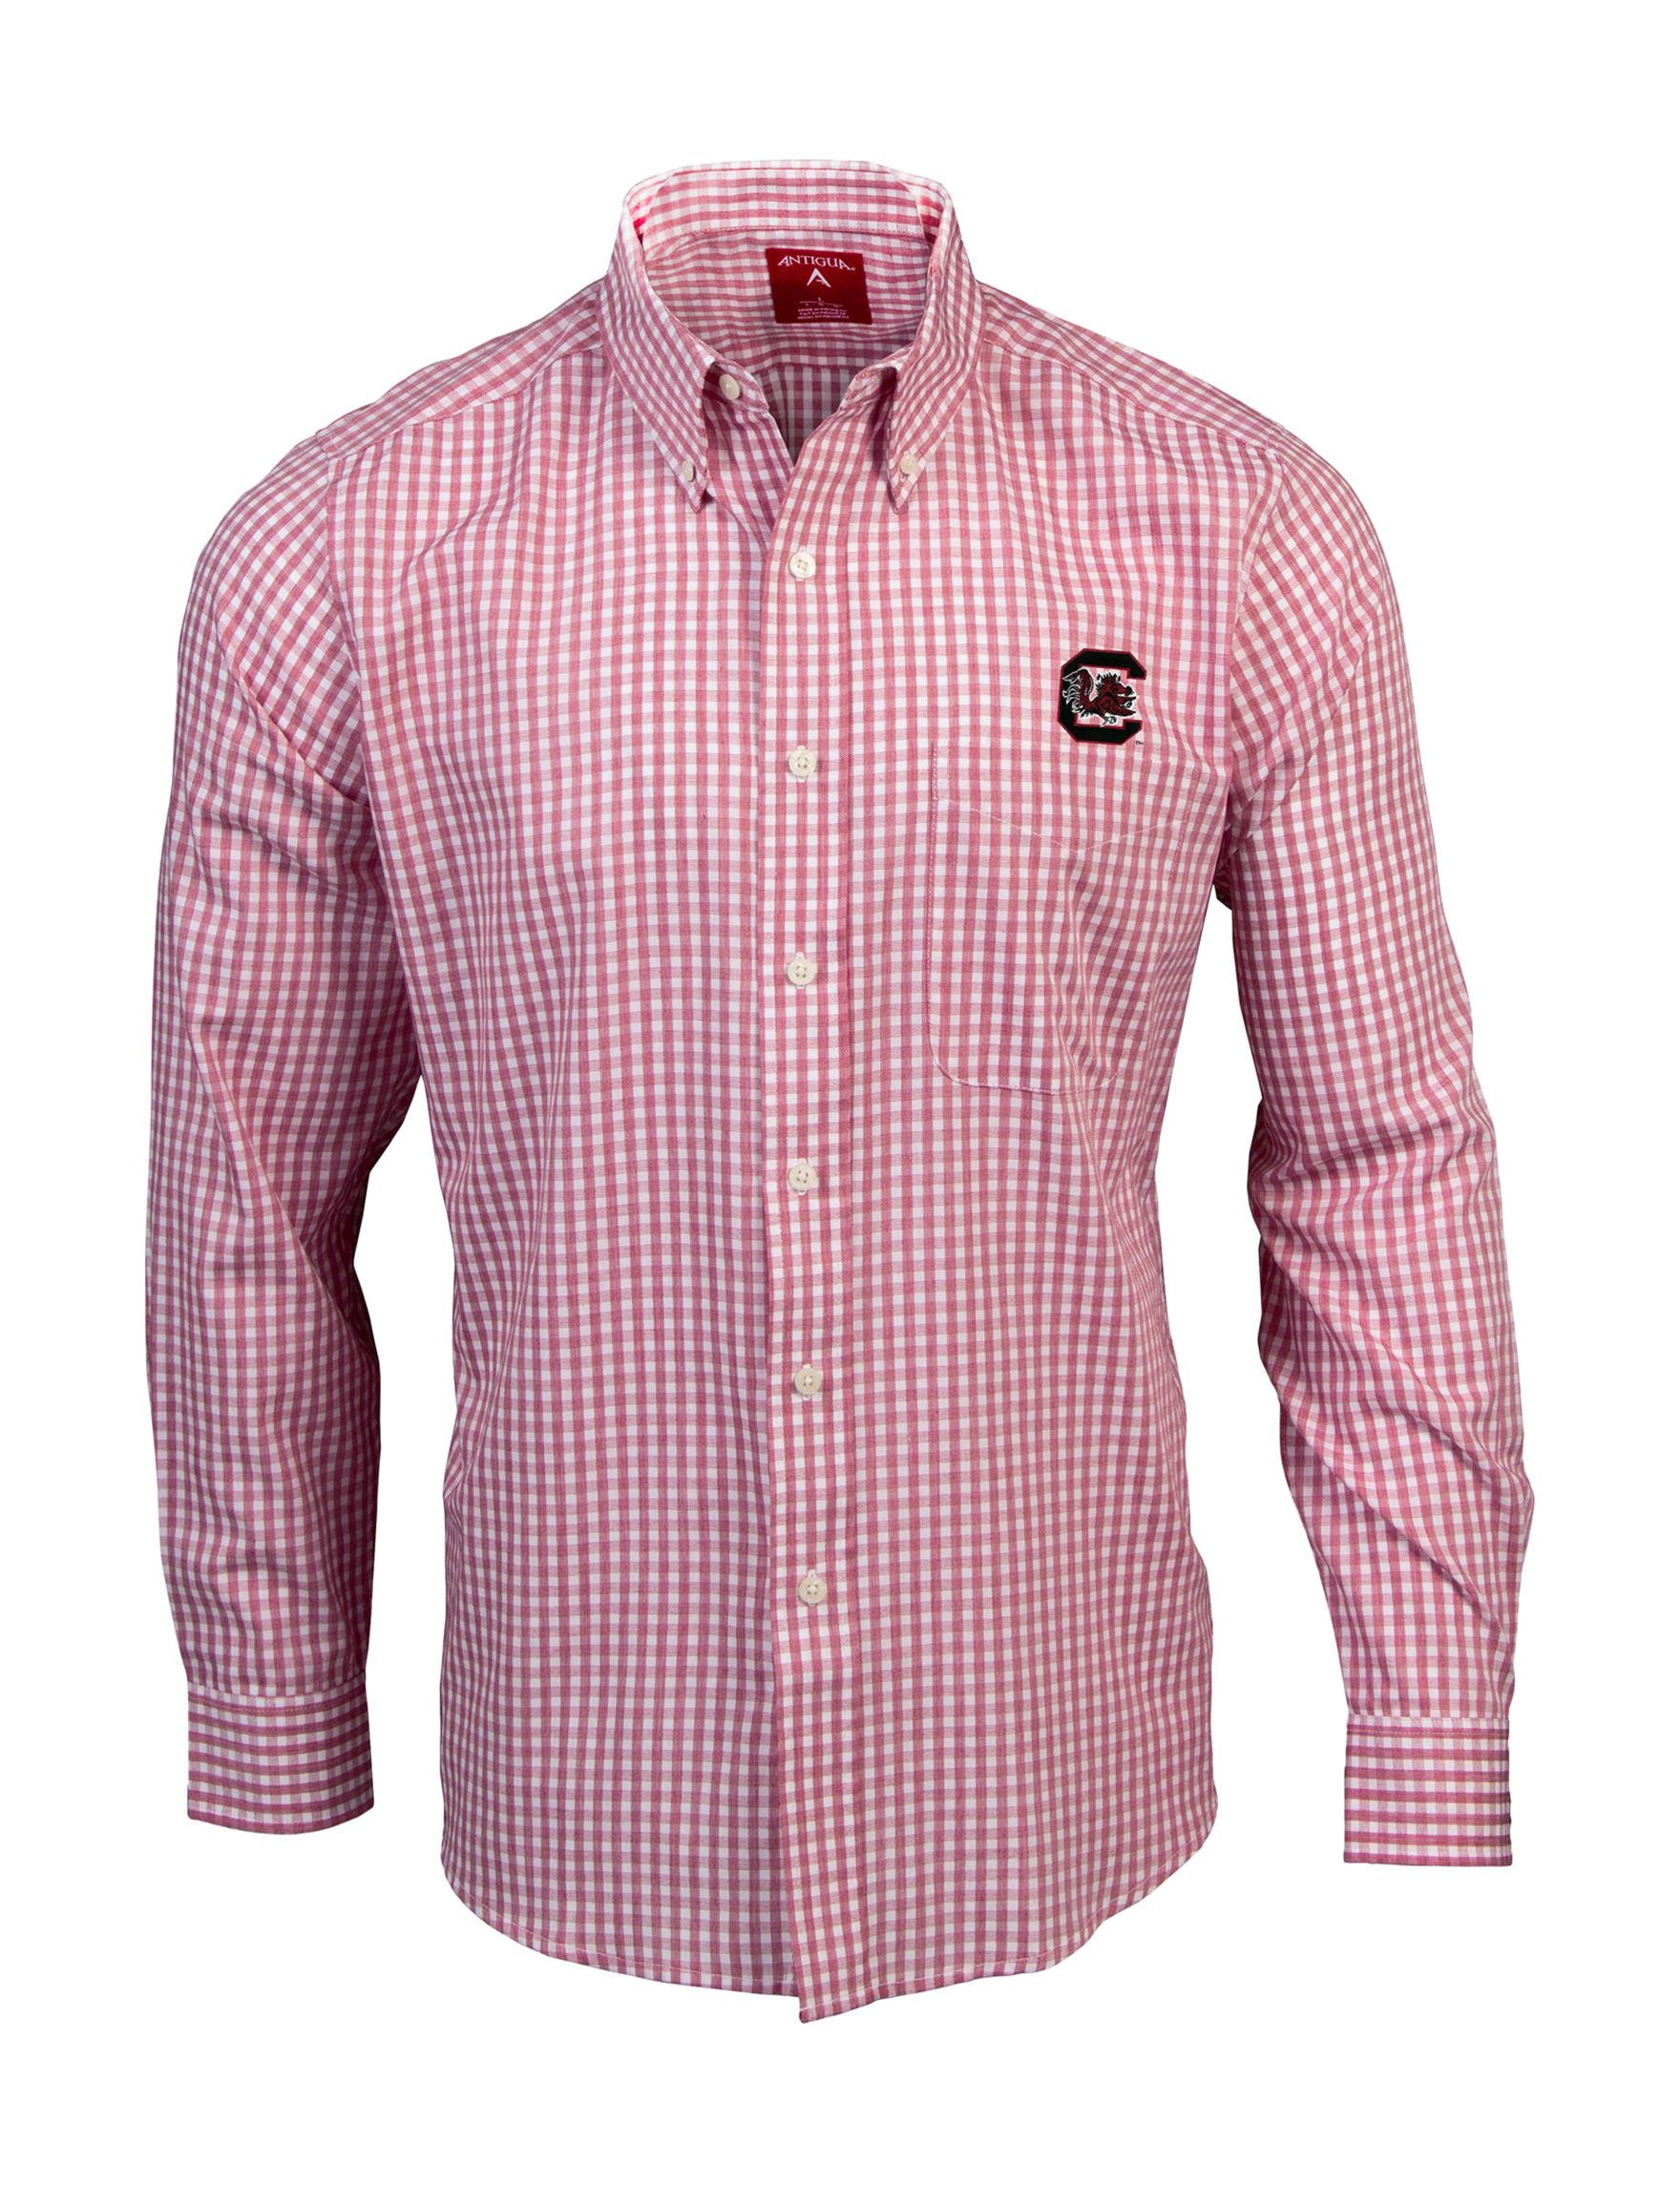 NCAA Maroon / White Casual Button Down Shirts